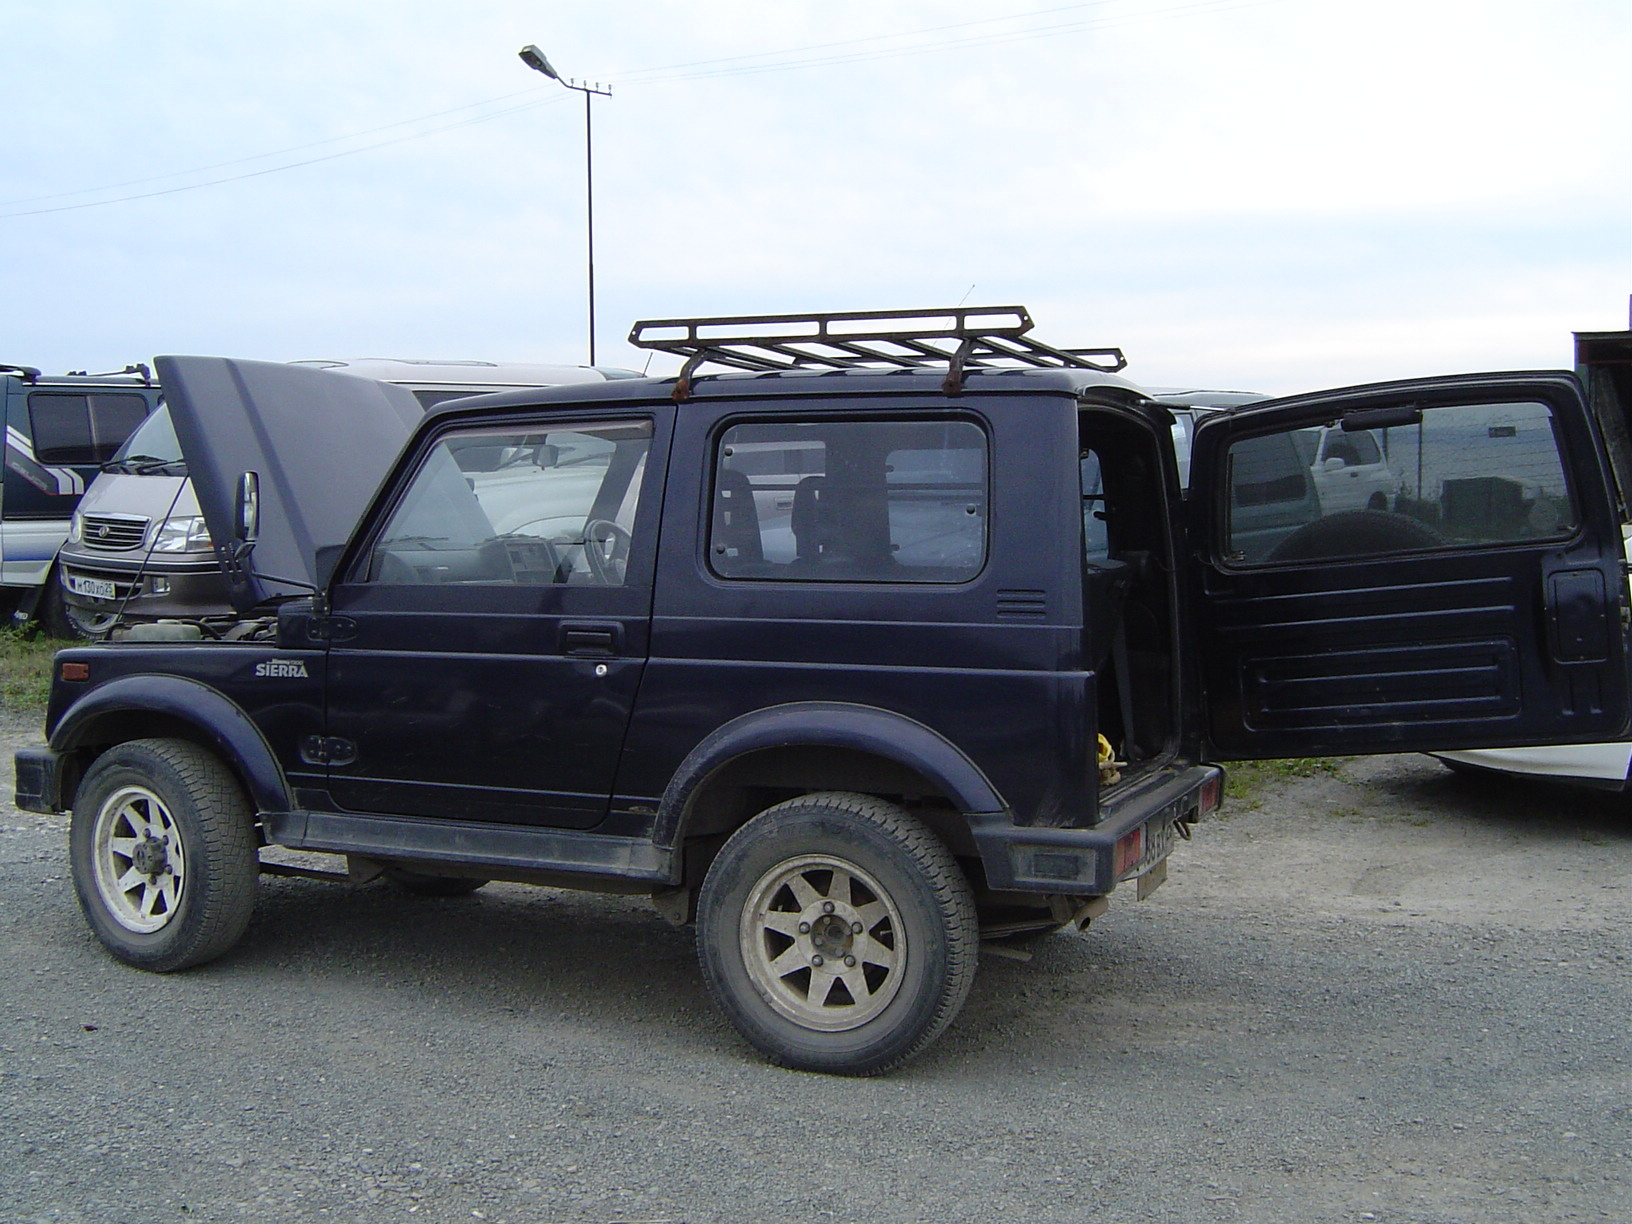 1993 Suzuki Jimny Sierra Pictures 1300cc Gasoline Automatic For Sale 2008 Xl7 Fuse Box